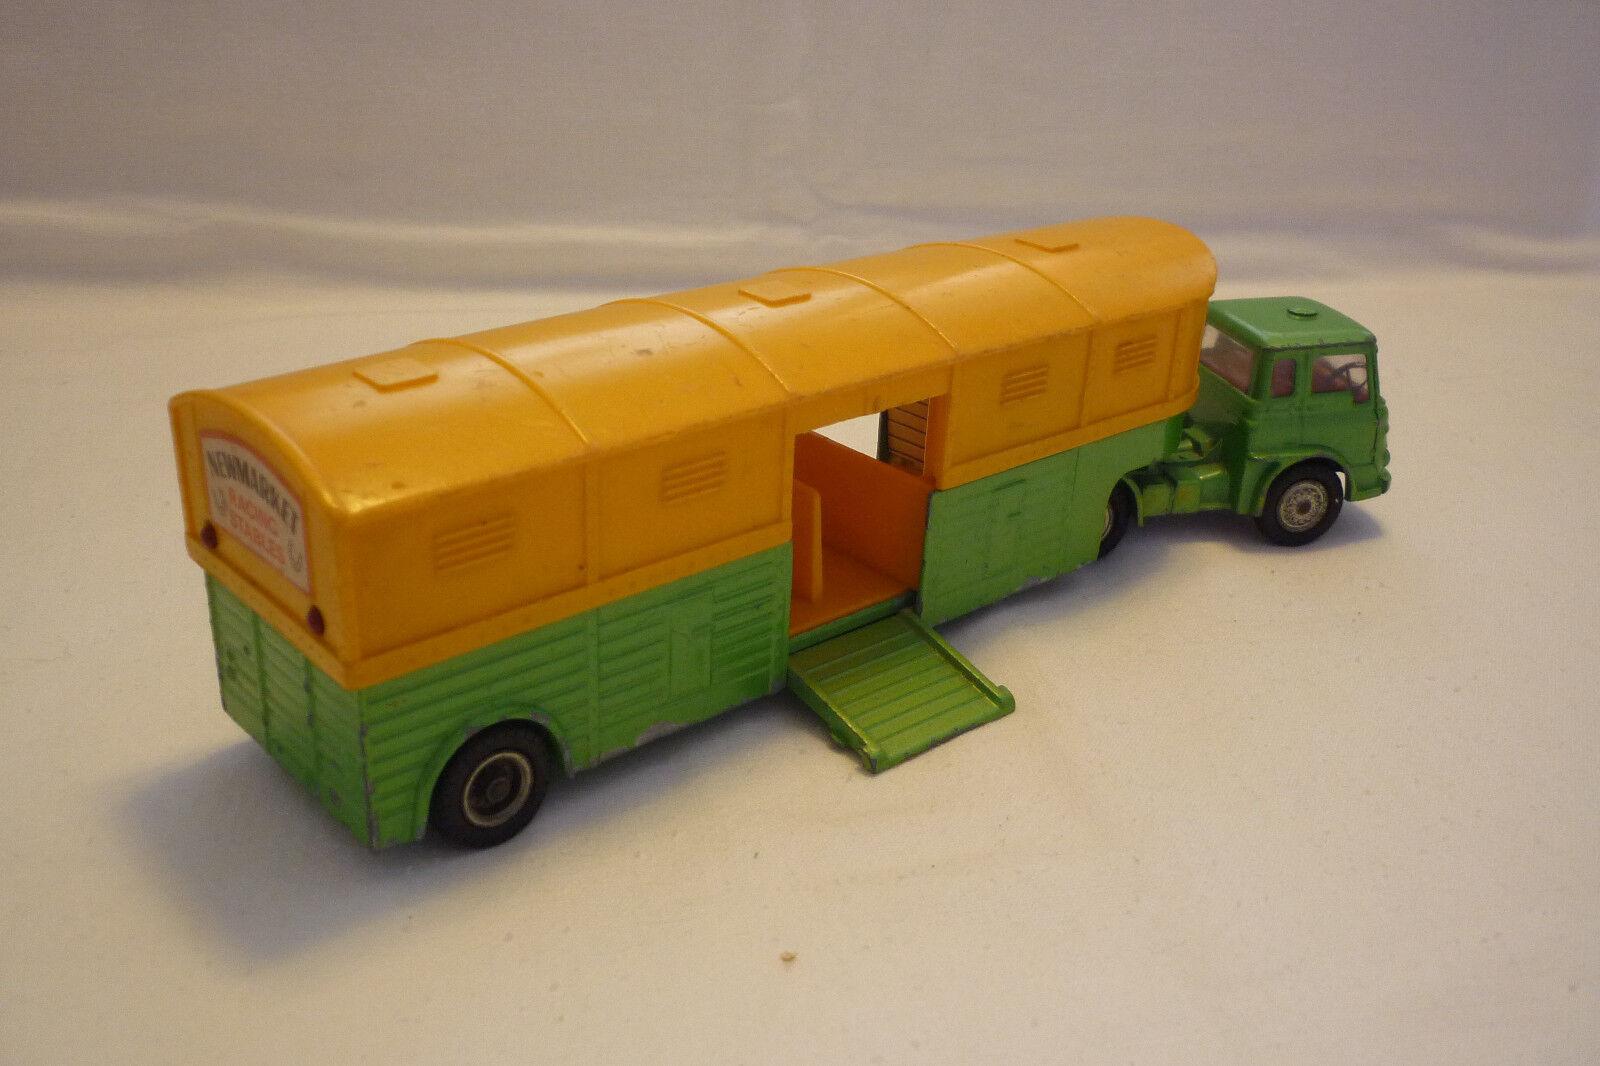 CORGI MAJOR TOYS - Metal Model - Bedford Articulated Articulated Articulated Horse Box - (corgi-t-27) 9f550f